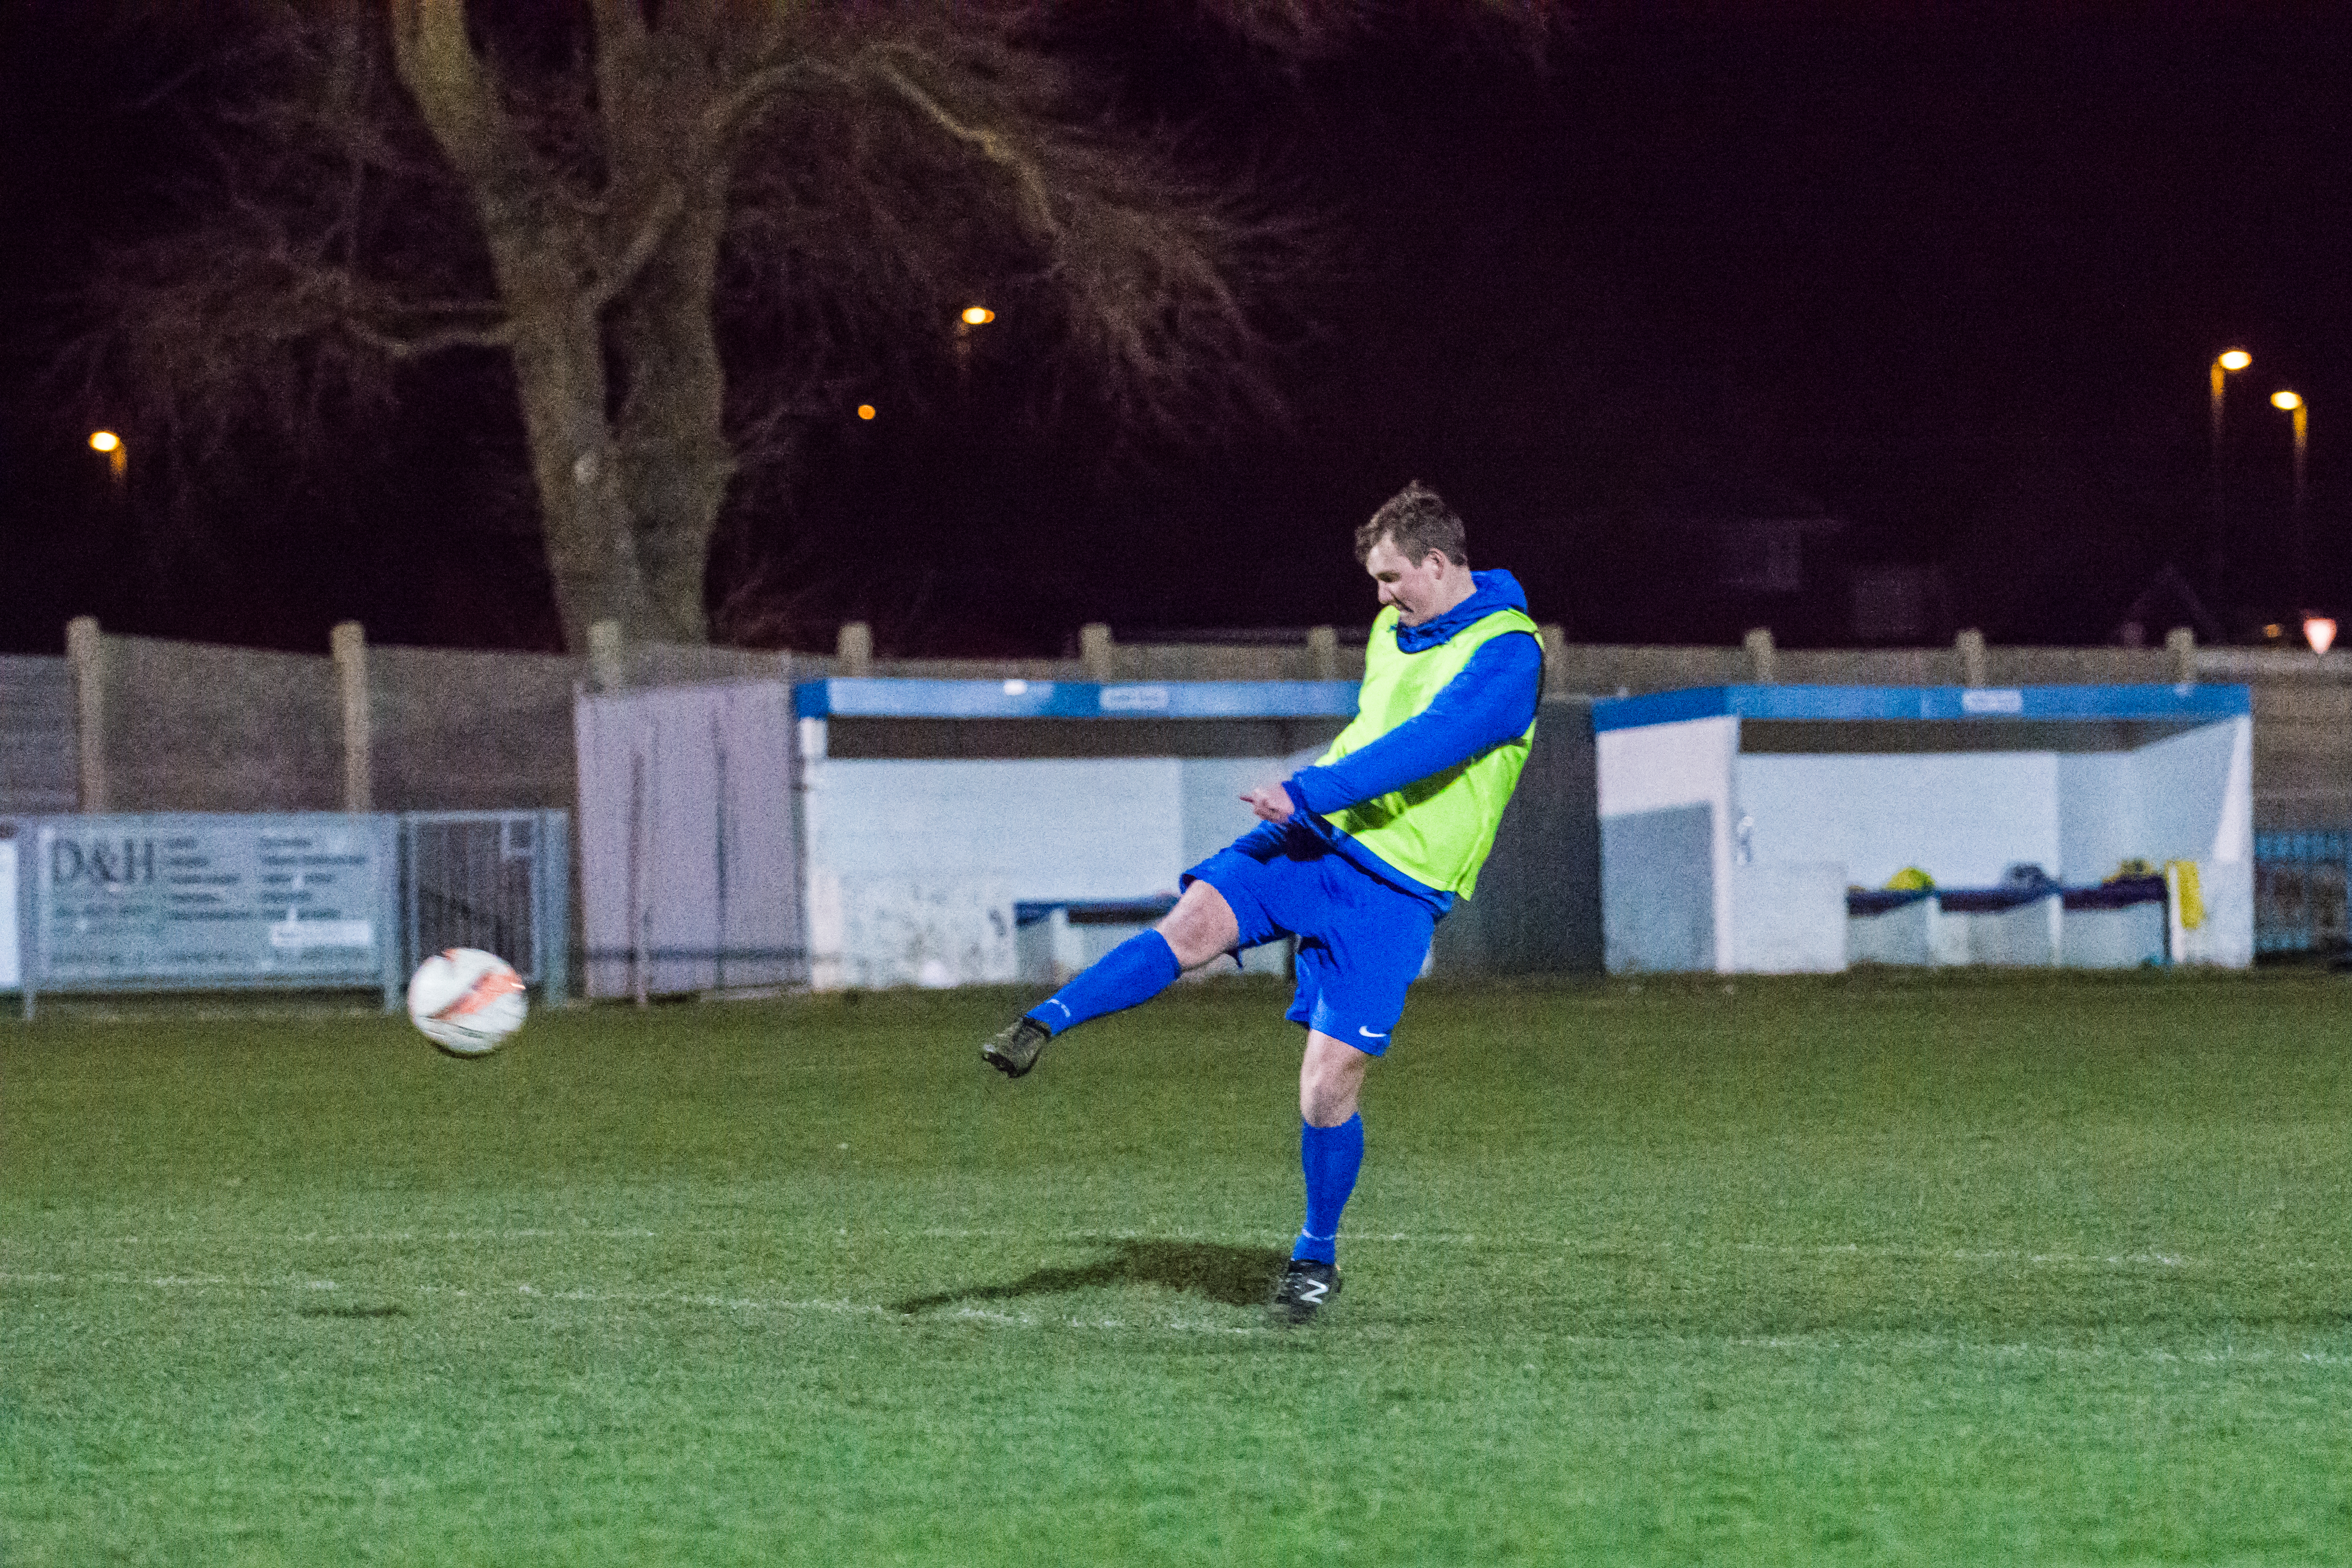 DAVID_JEFFERY Shoreham FC U18s vs Woking FC Academy 22.03.18 49